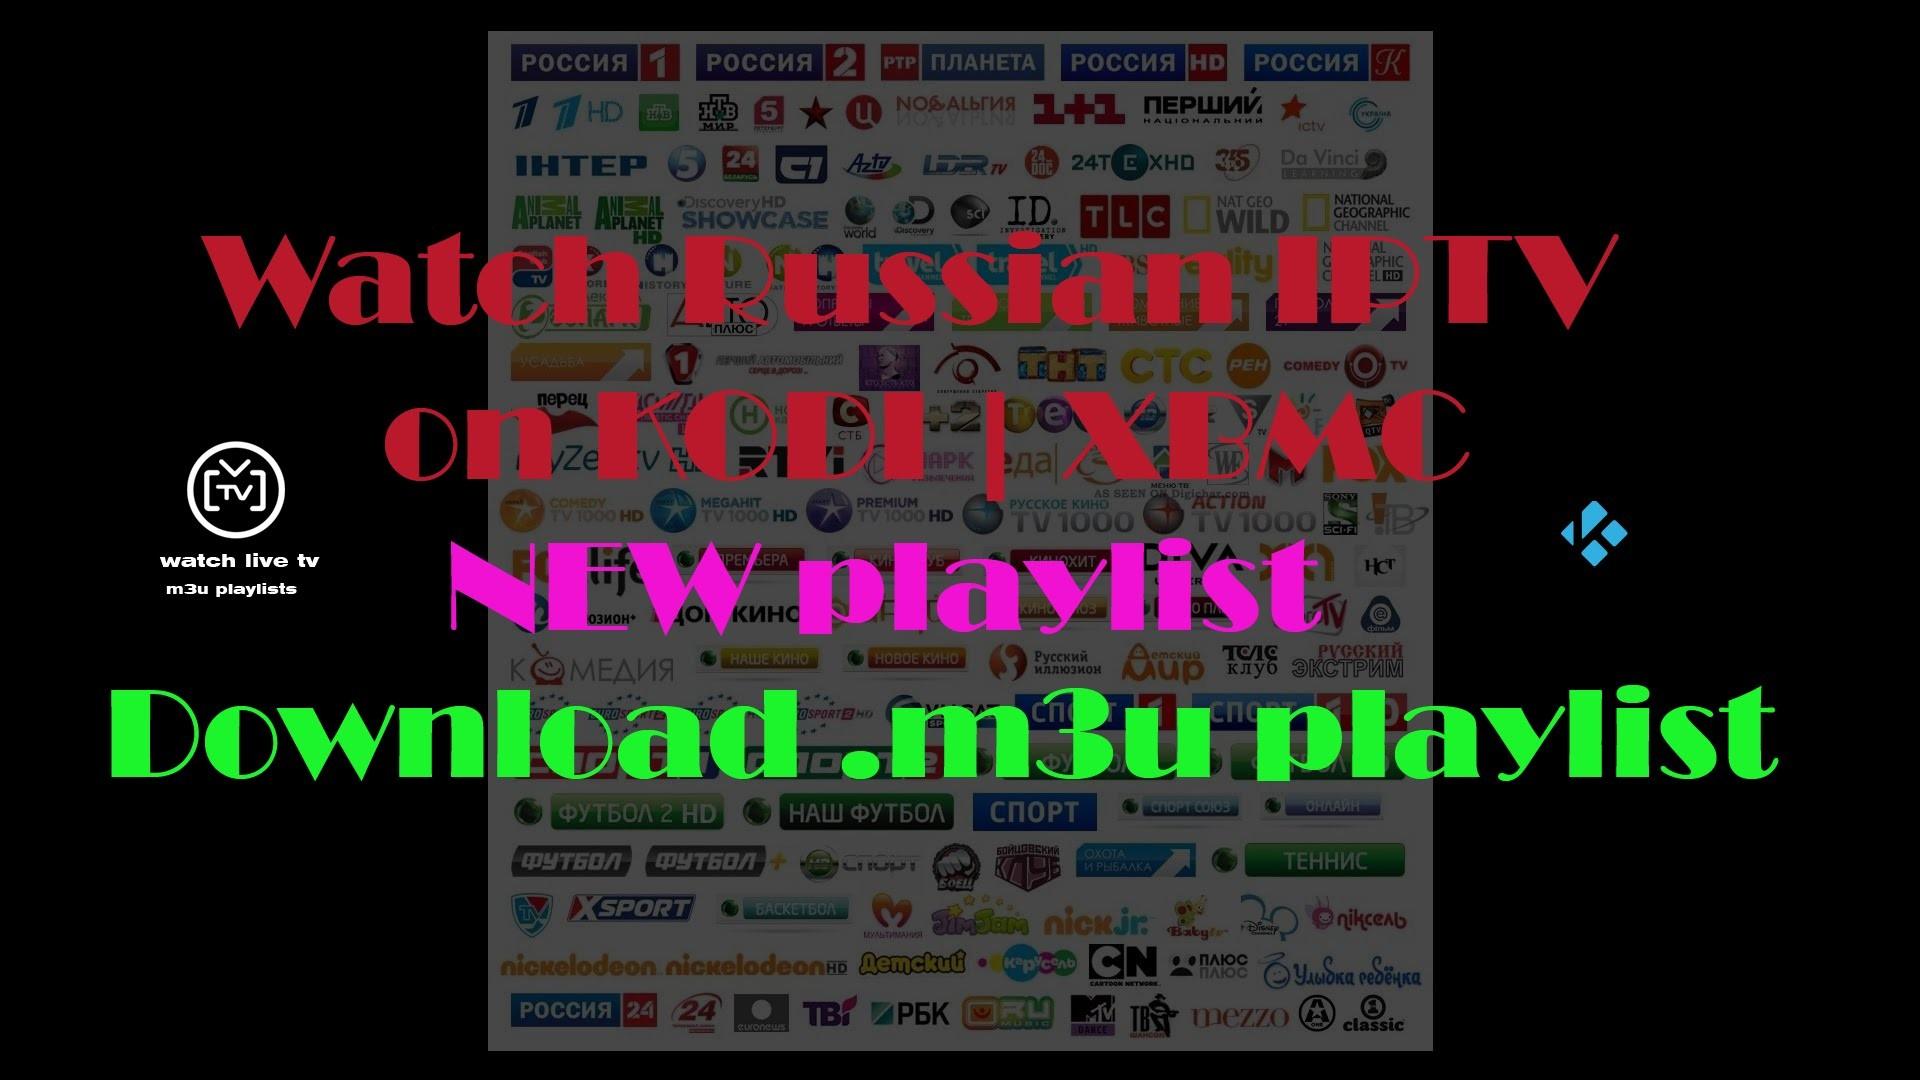 Russian IP TV   Watch Live ON KODI   XBMC   2017 download new .m3u playlist  – YouTube